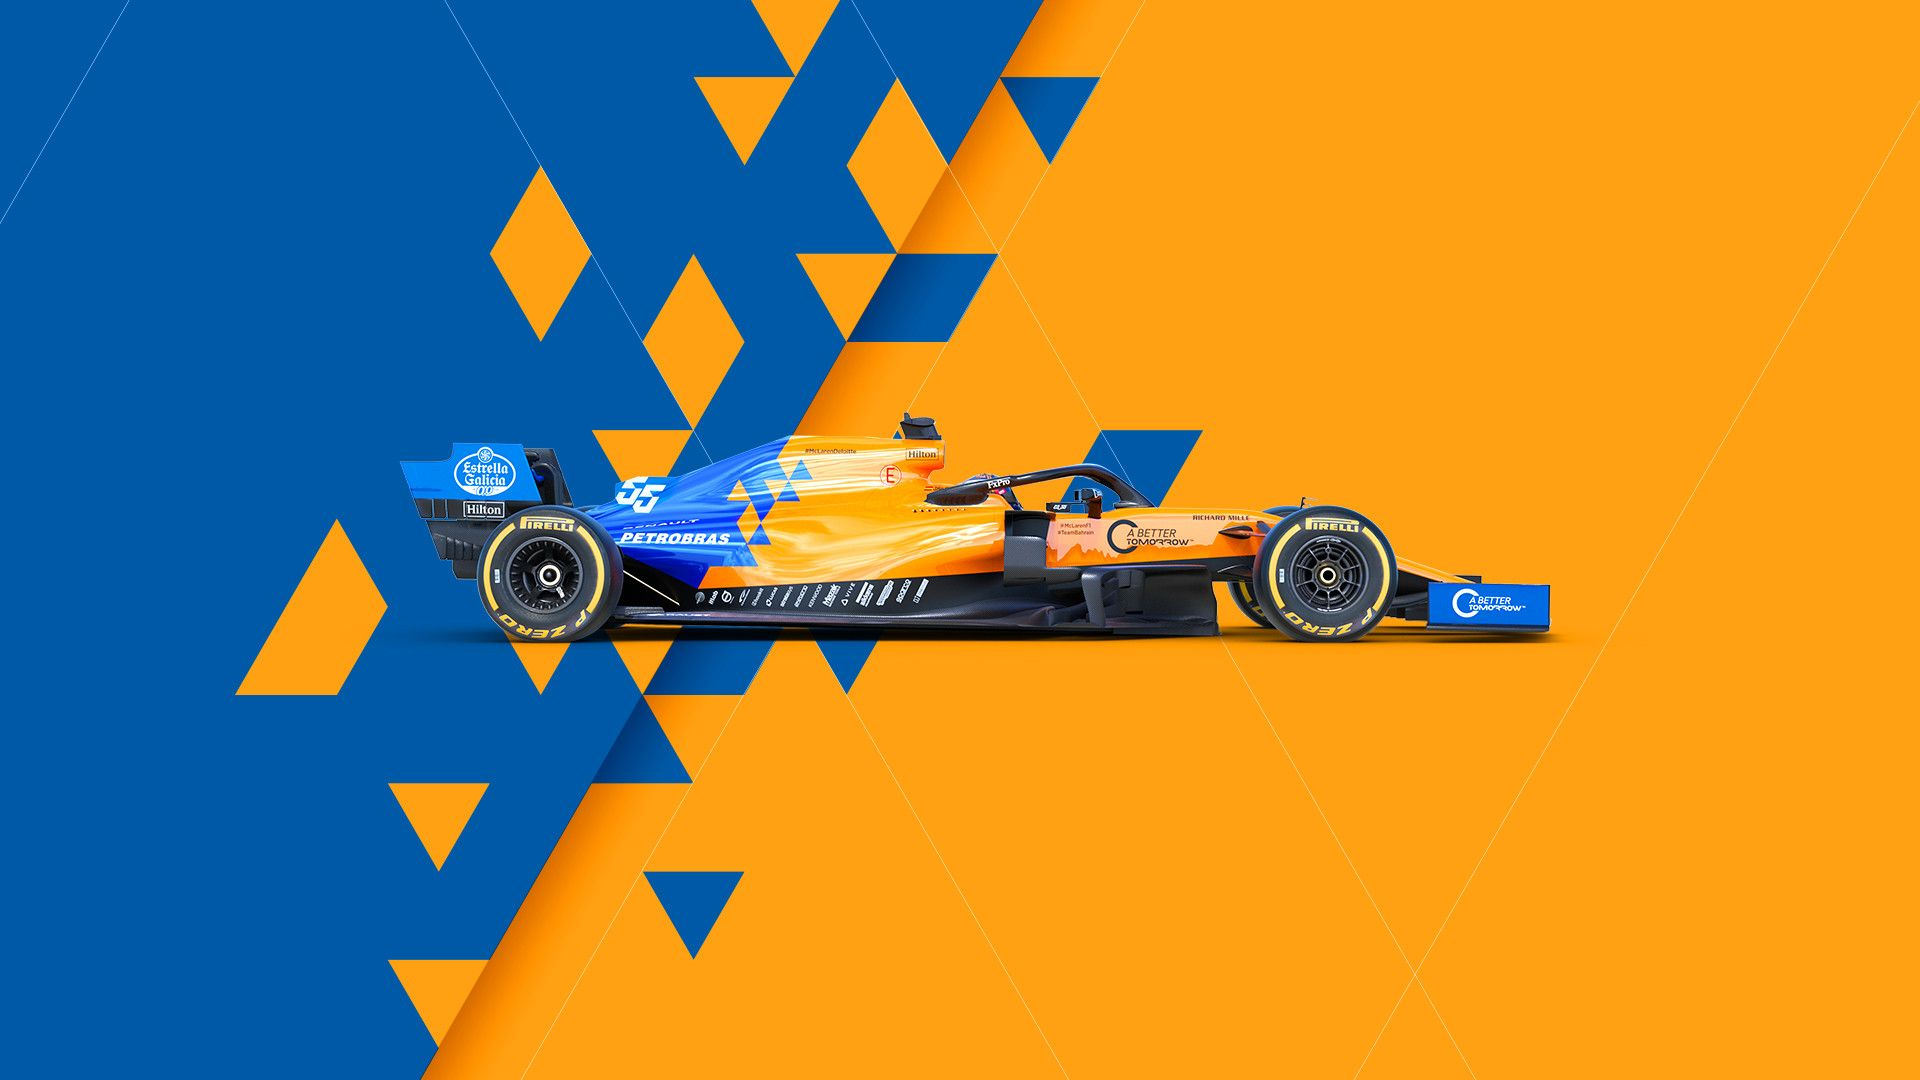 McLaren Formula 1 Wallpapers   Top McLaren Formula 1 1920x1080